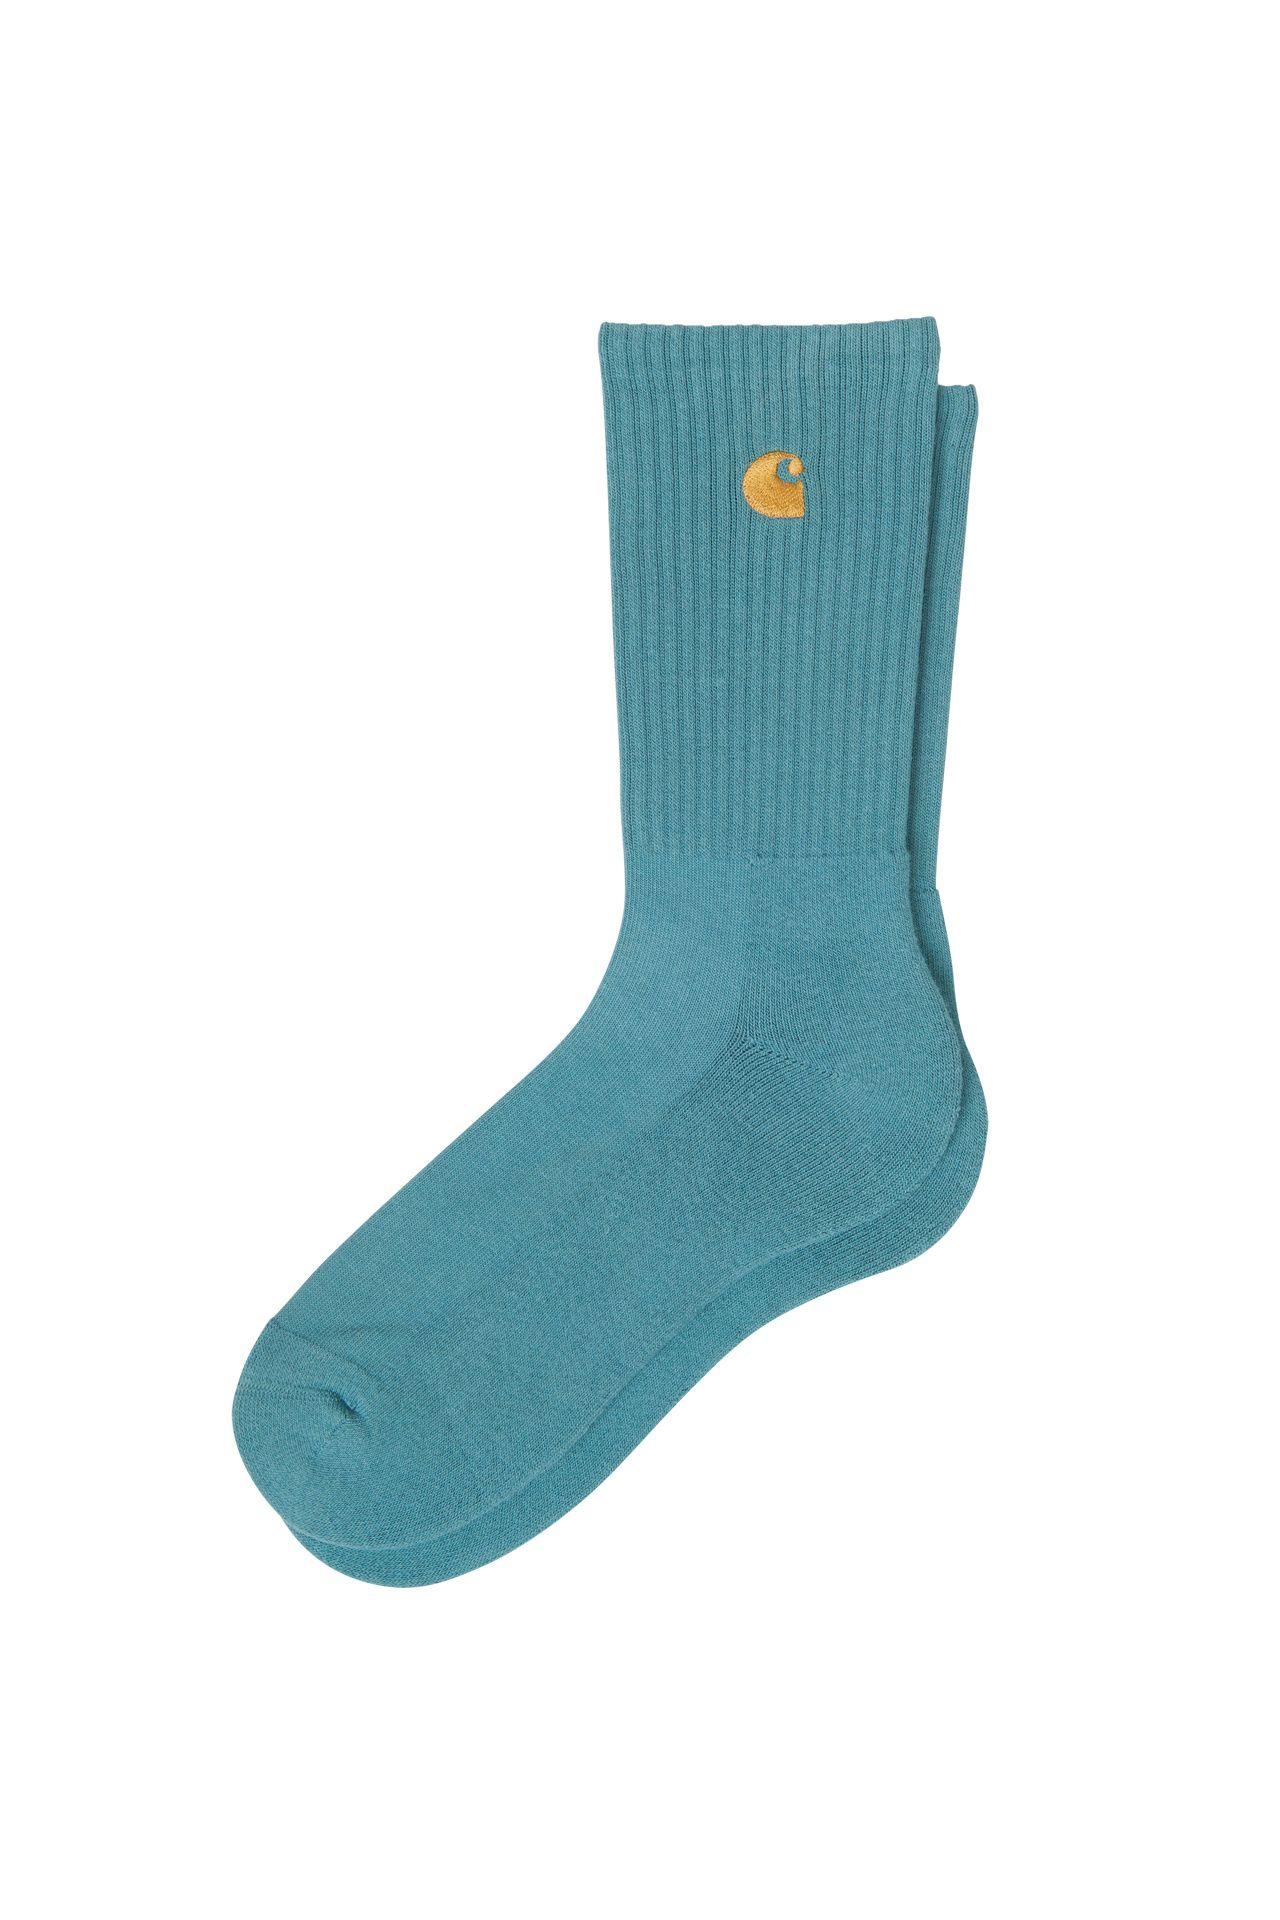 Afbeelding van Carhartt WIP Sokken Chase Socks Hydro/Gold I029421